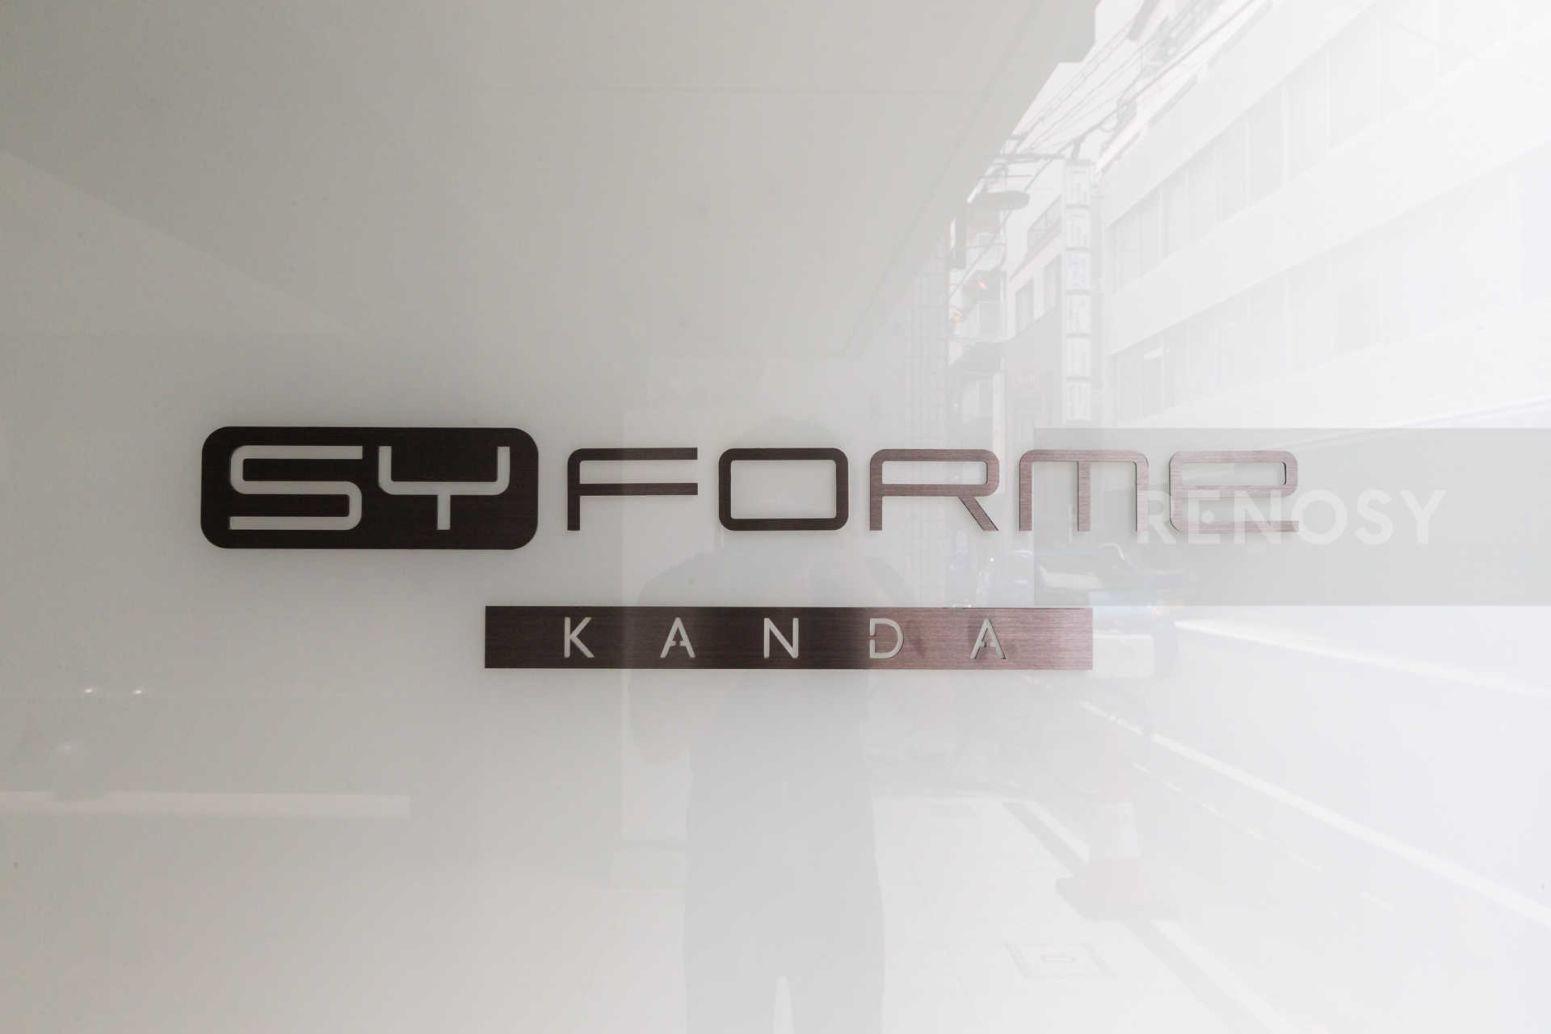 SYFORME KANDA